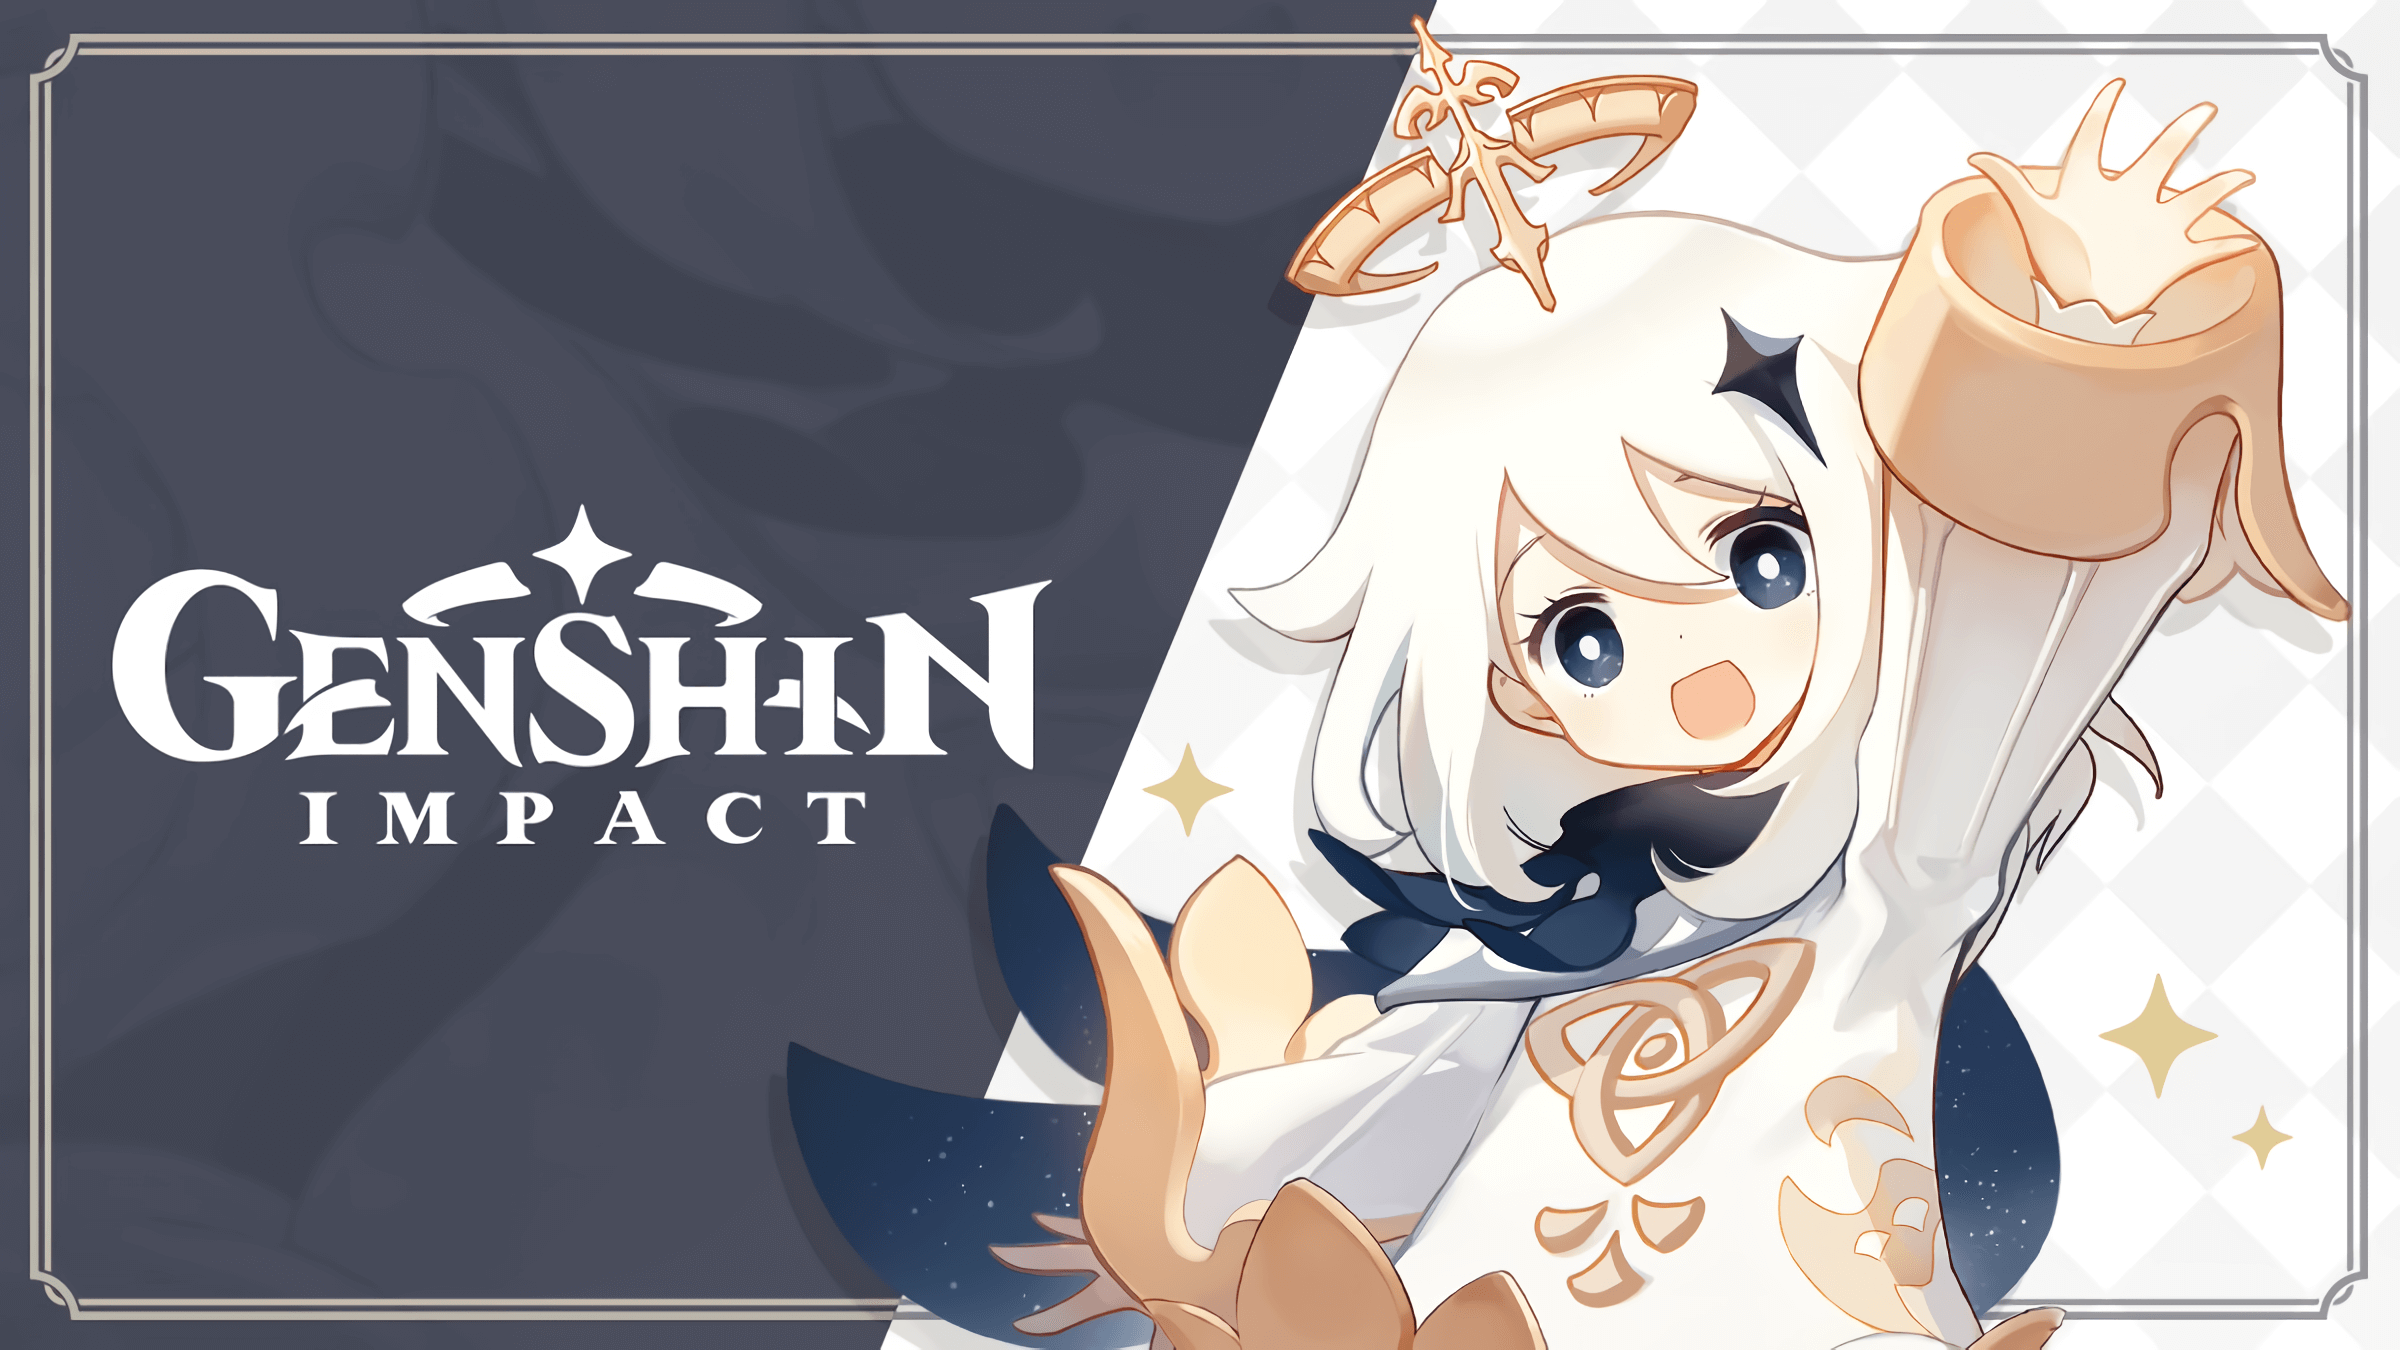 Genshin Impact Wallpaper Genshin Impact Game Db